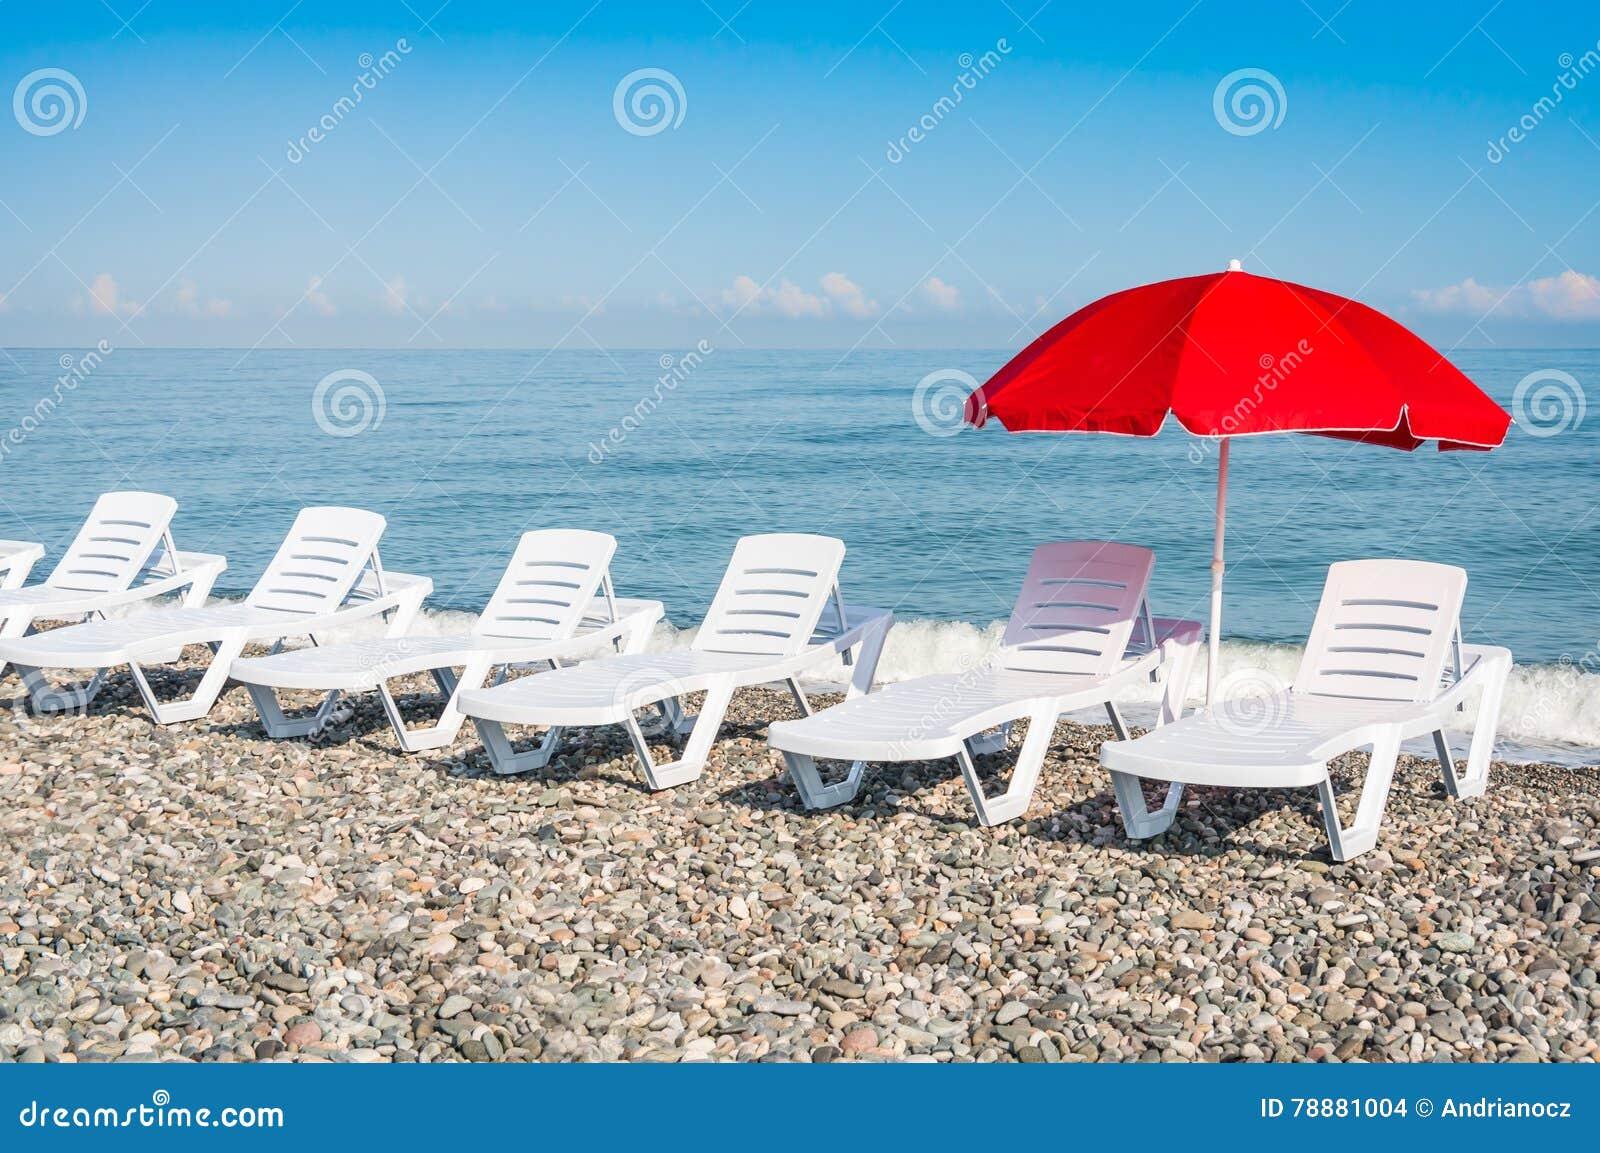 Beach Chairs And Red Umbrella On Shingle Beach Stock Photo - Image ...